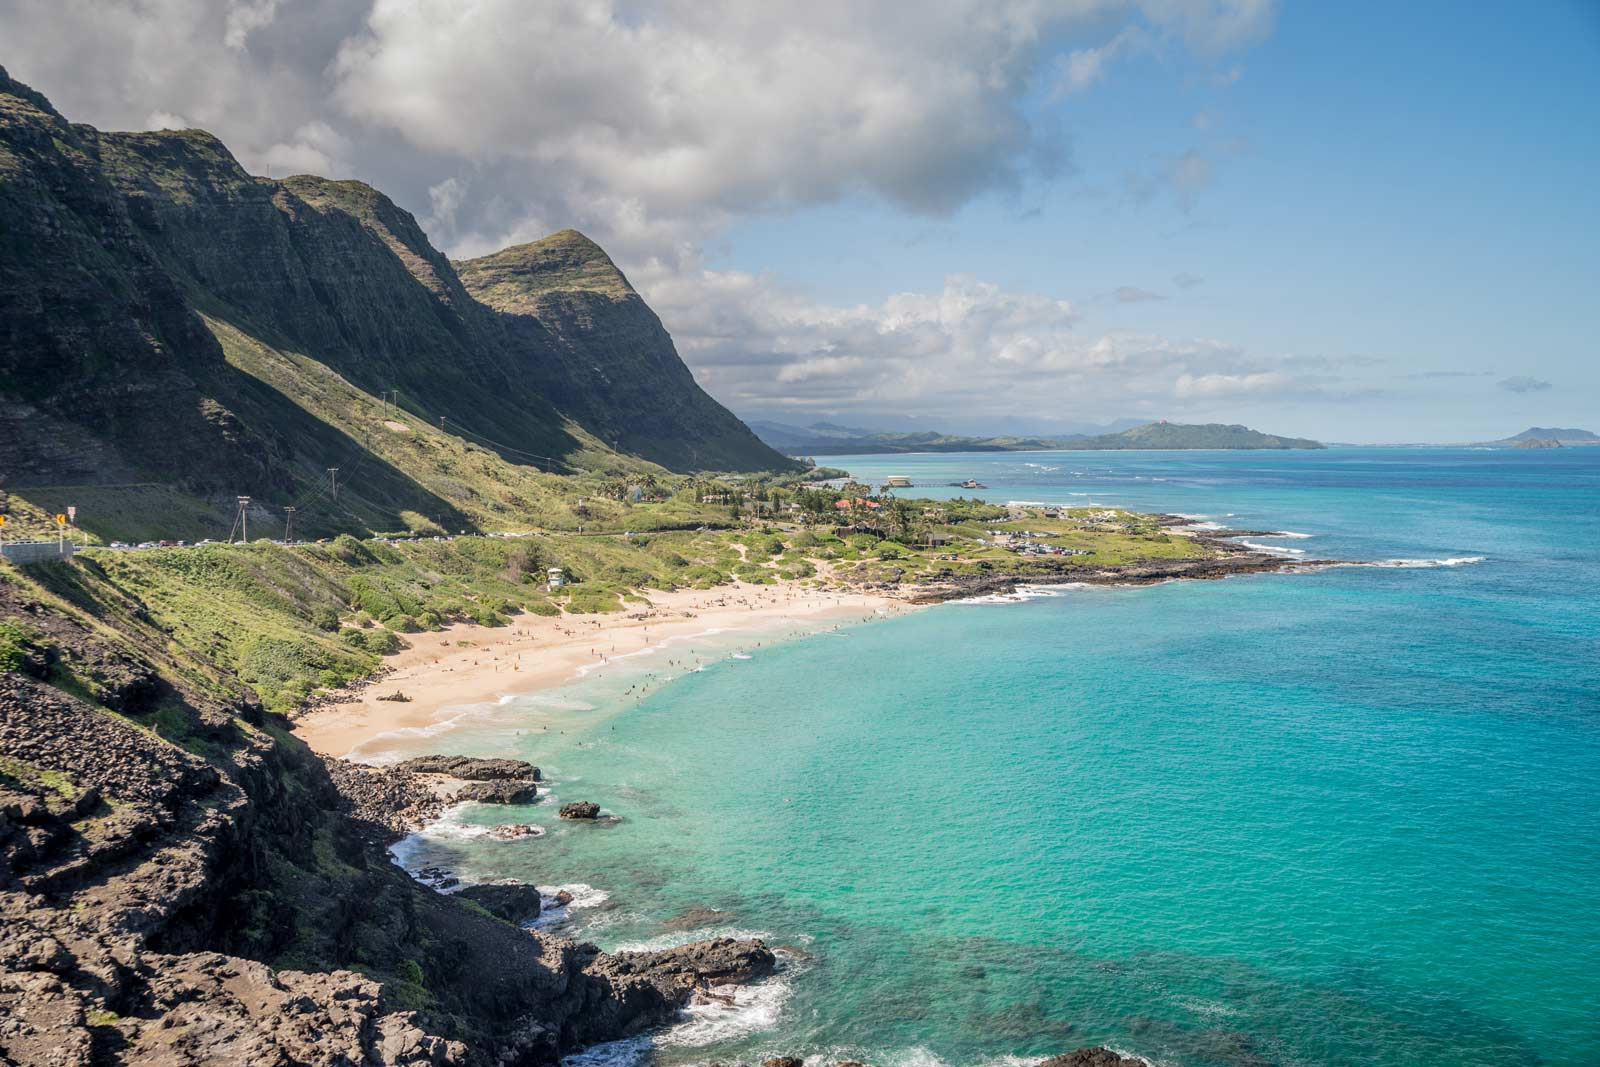 Hawaii has a diverse landscape